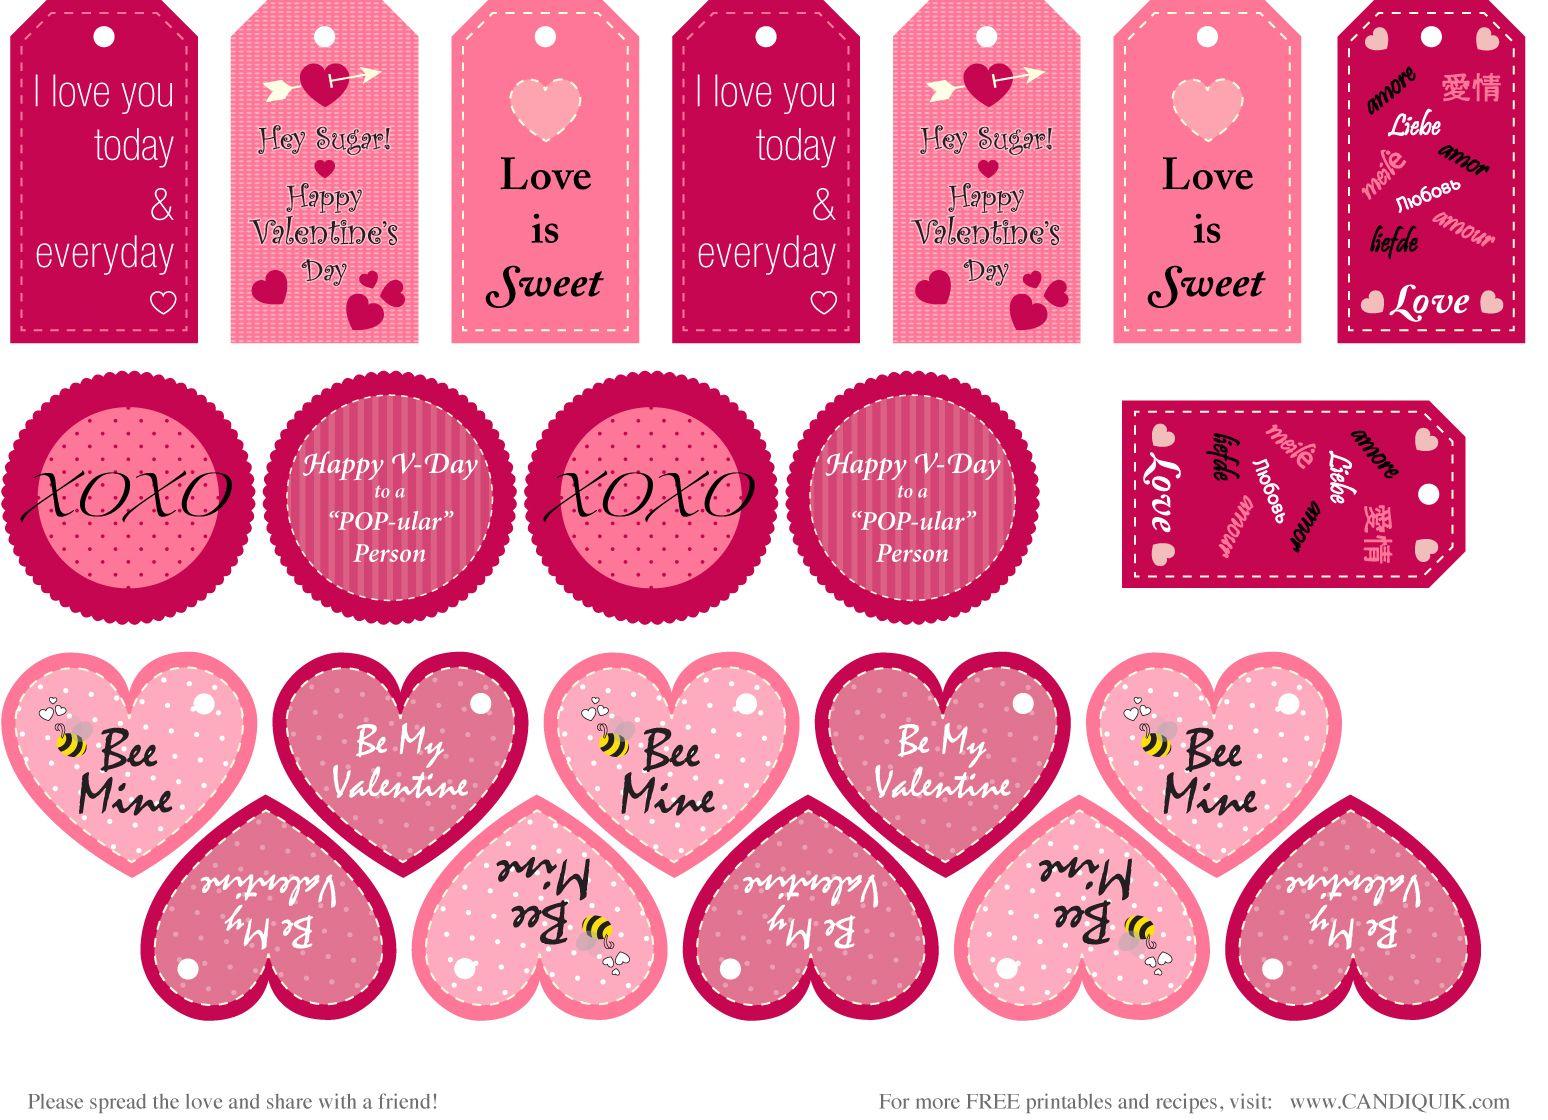 Free} Printables   Valentines   Pinterest   Valentine's Day - Free Printable Valentine Graphics